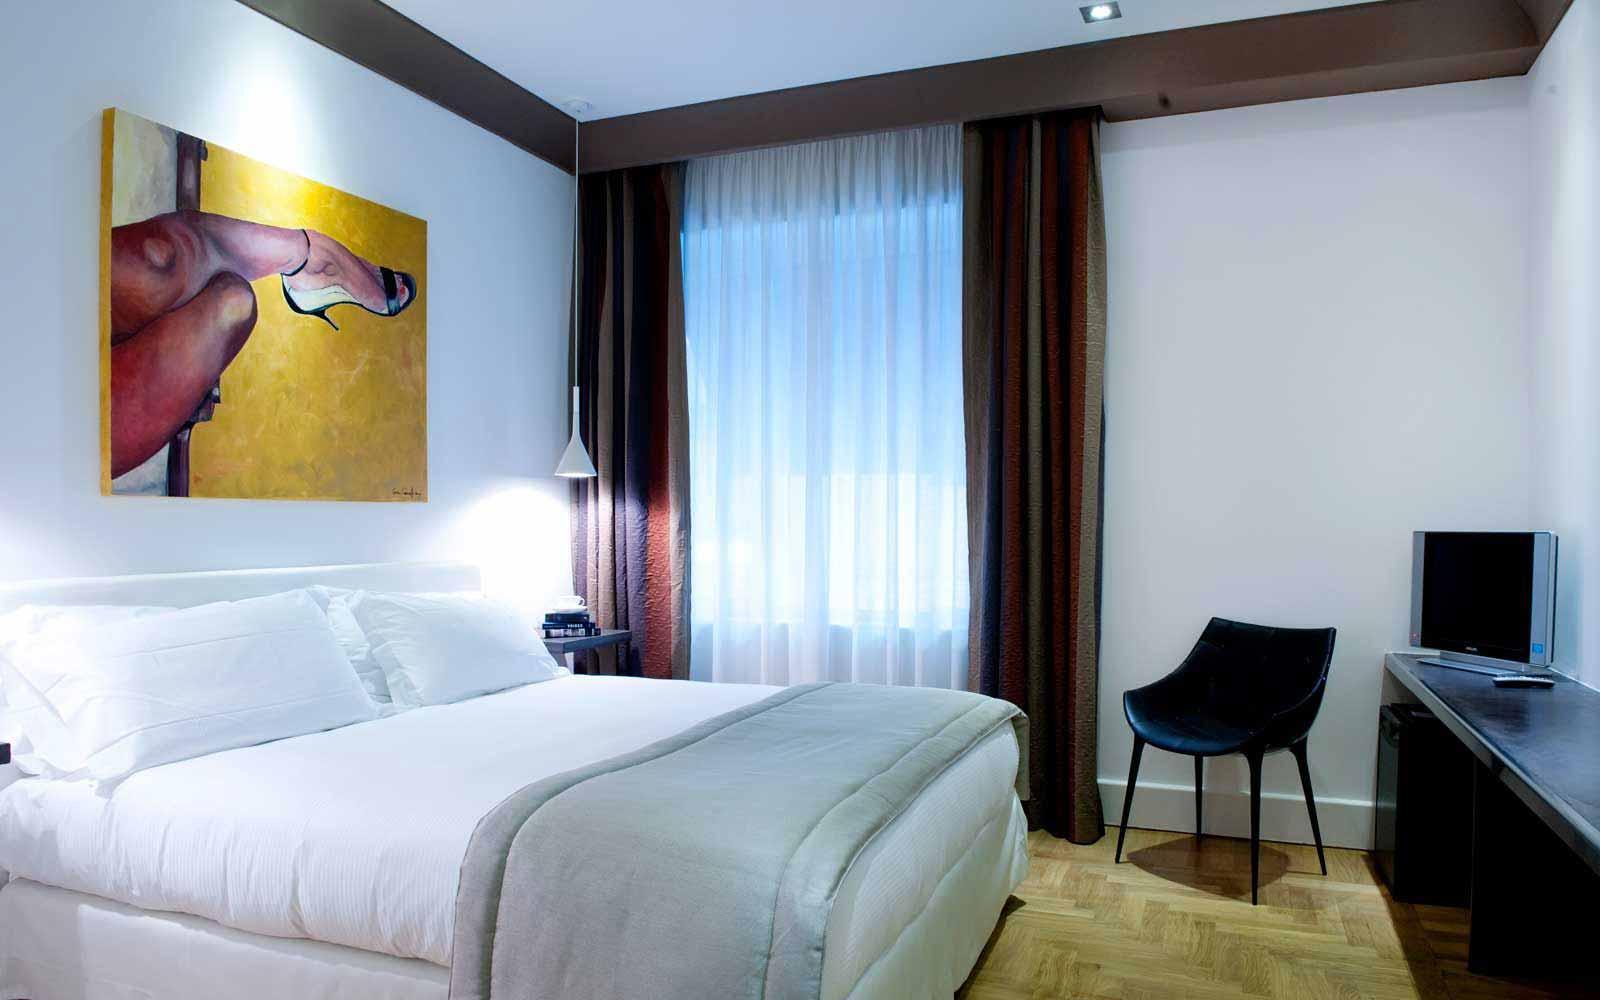 Deluxe room at Hotel Principe Di Villafranca